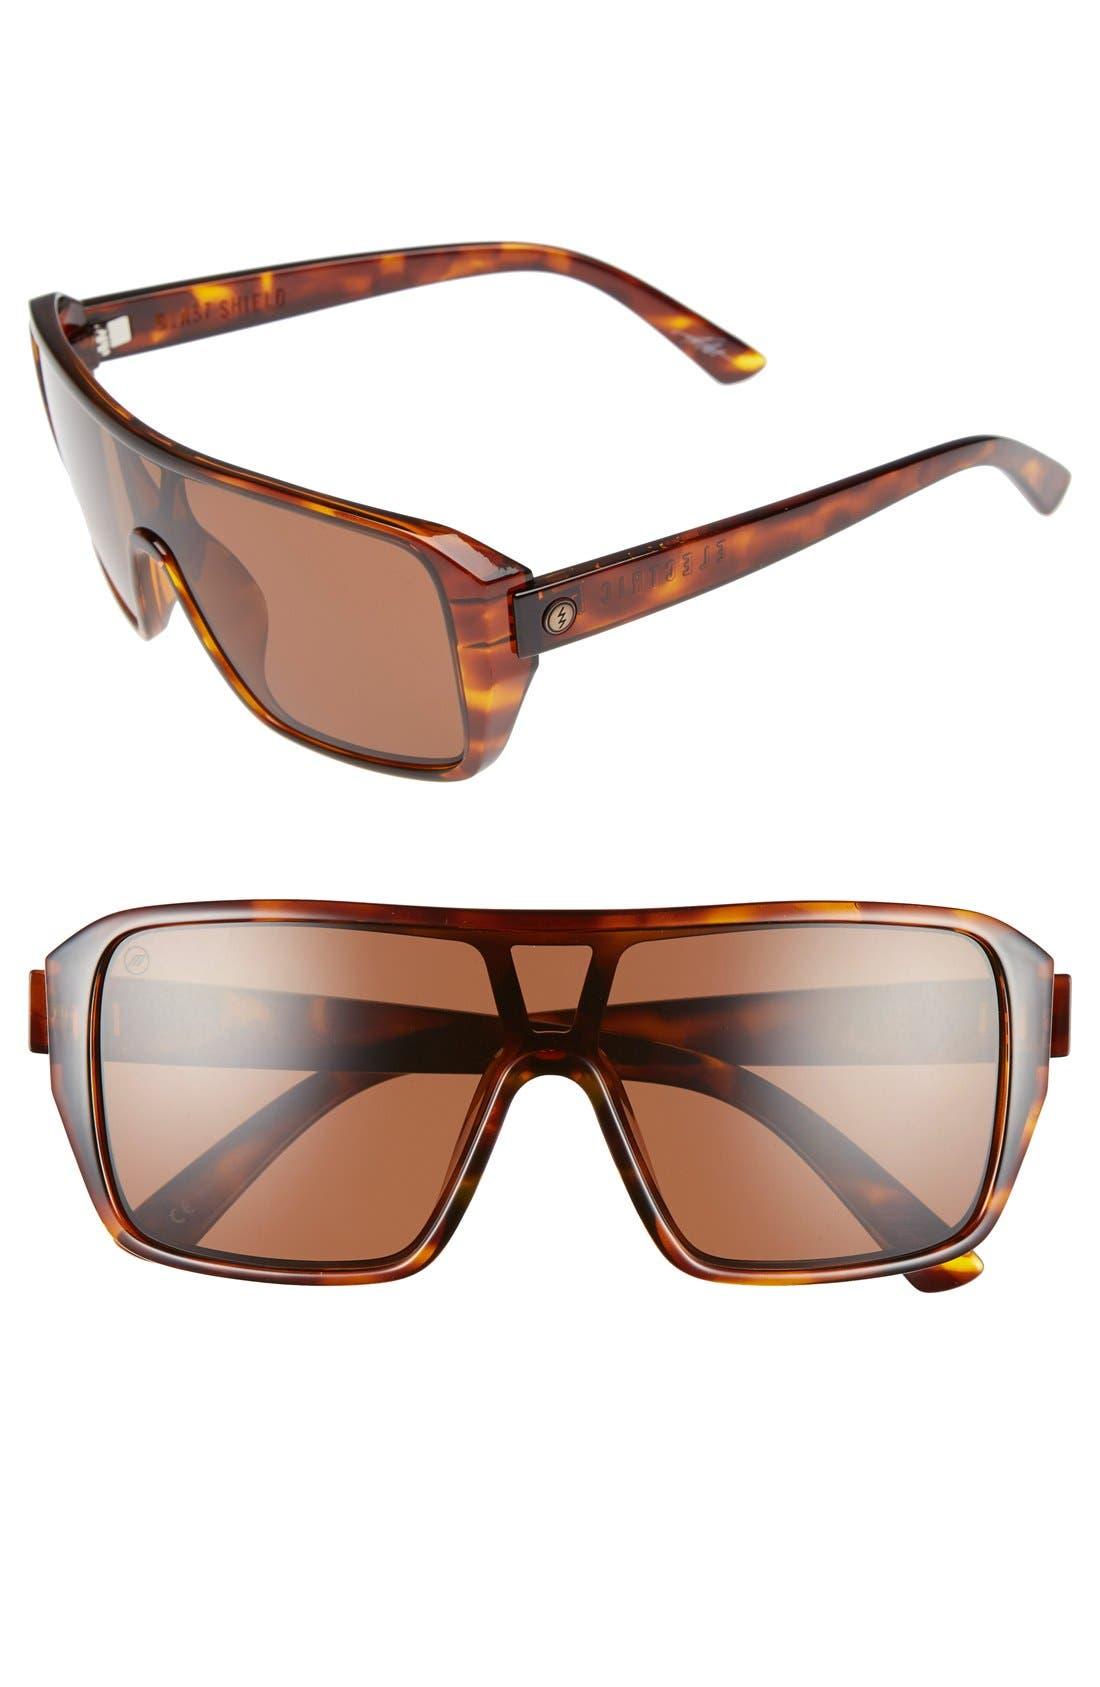 ELECTRIC Blast 60mm Shield Sunglasses